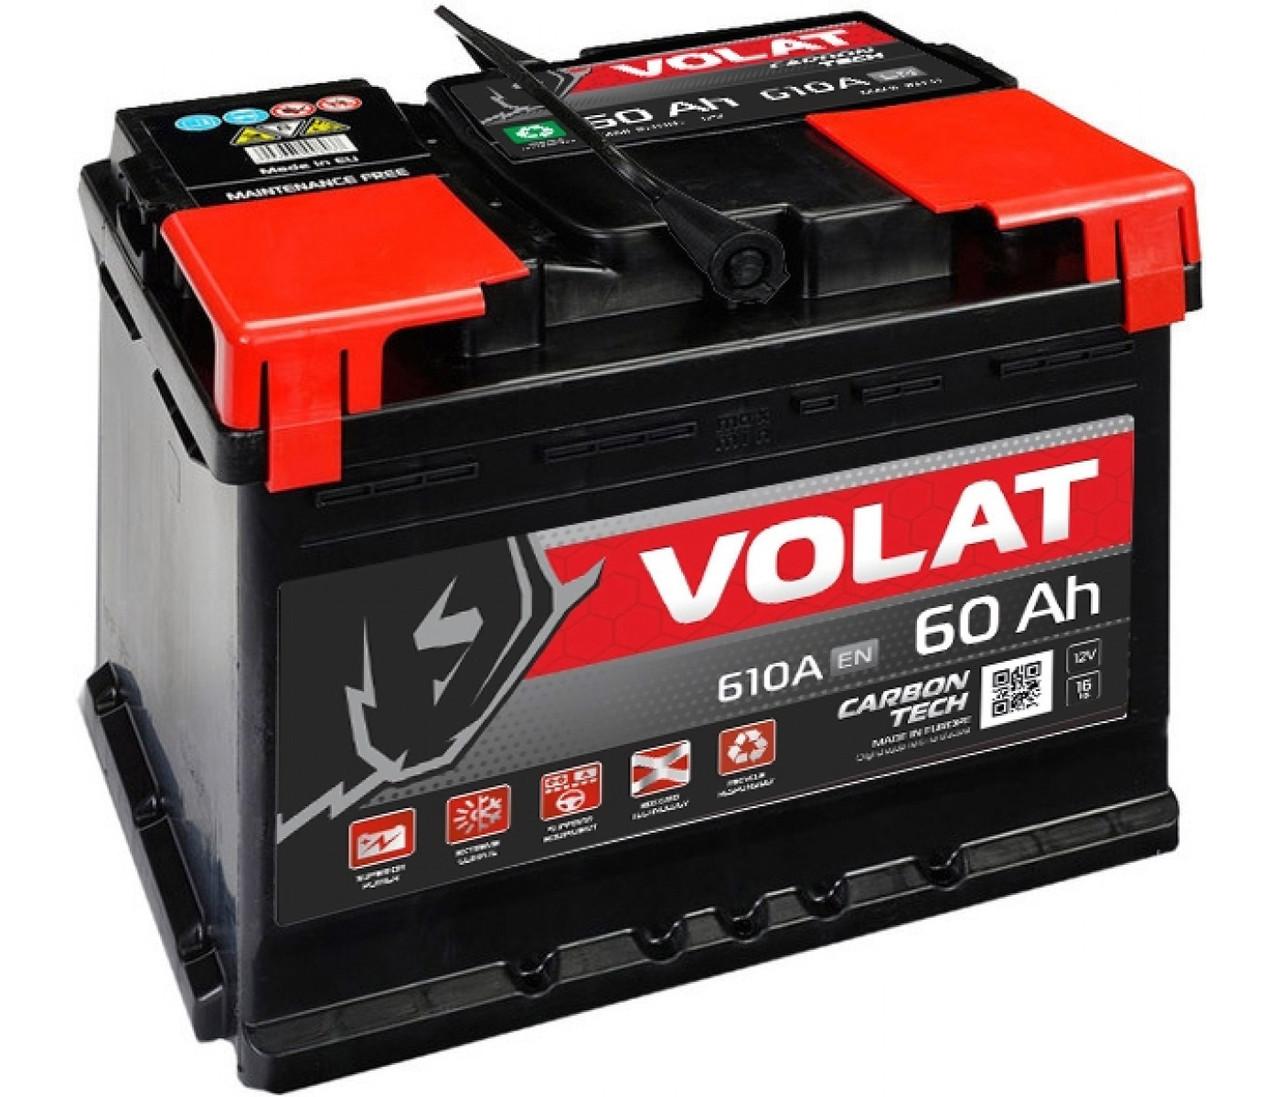 Аккумулятор VOLAT -60A +прав (L2) (600 пуск) , 47474